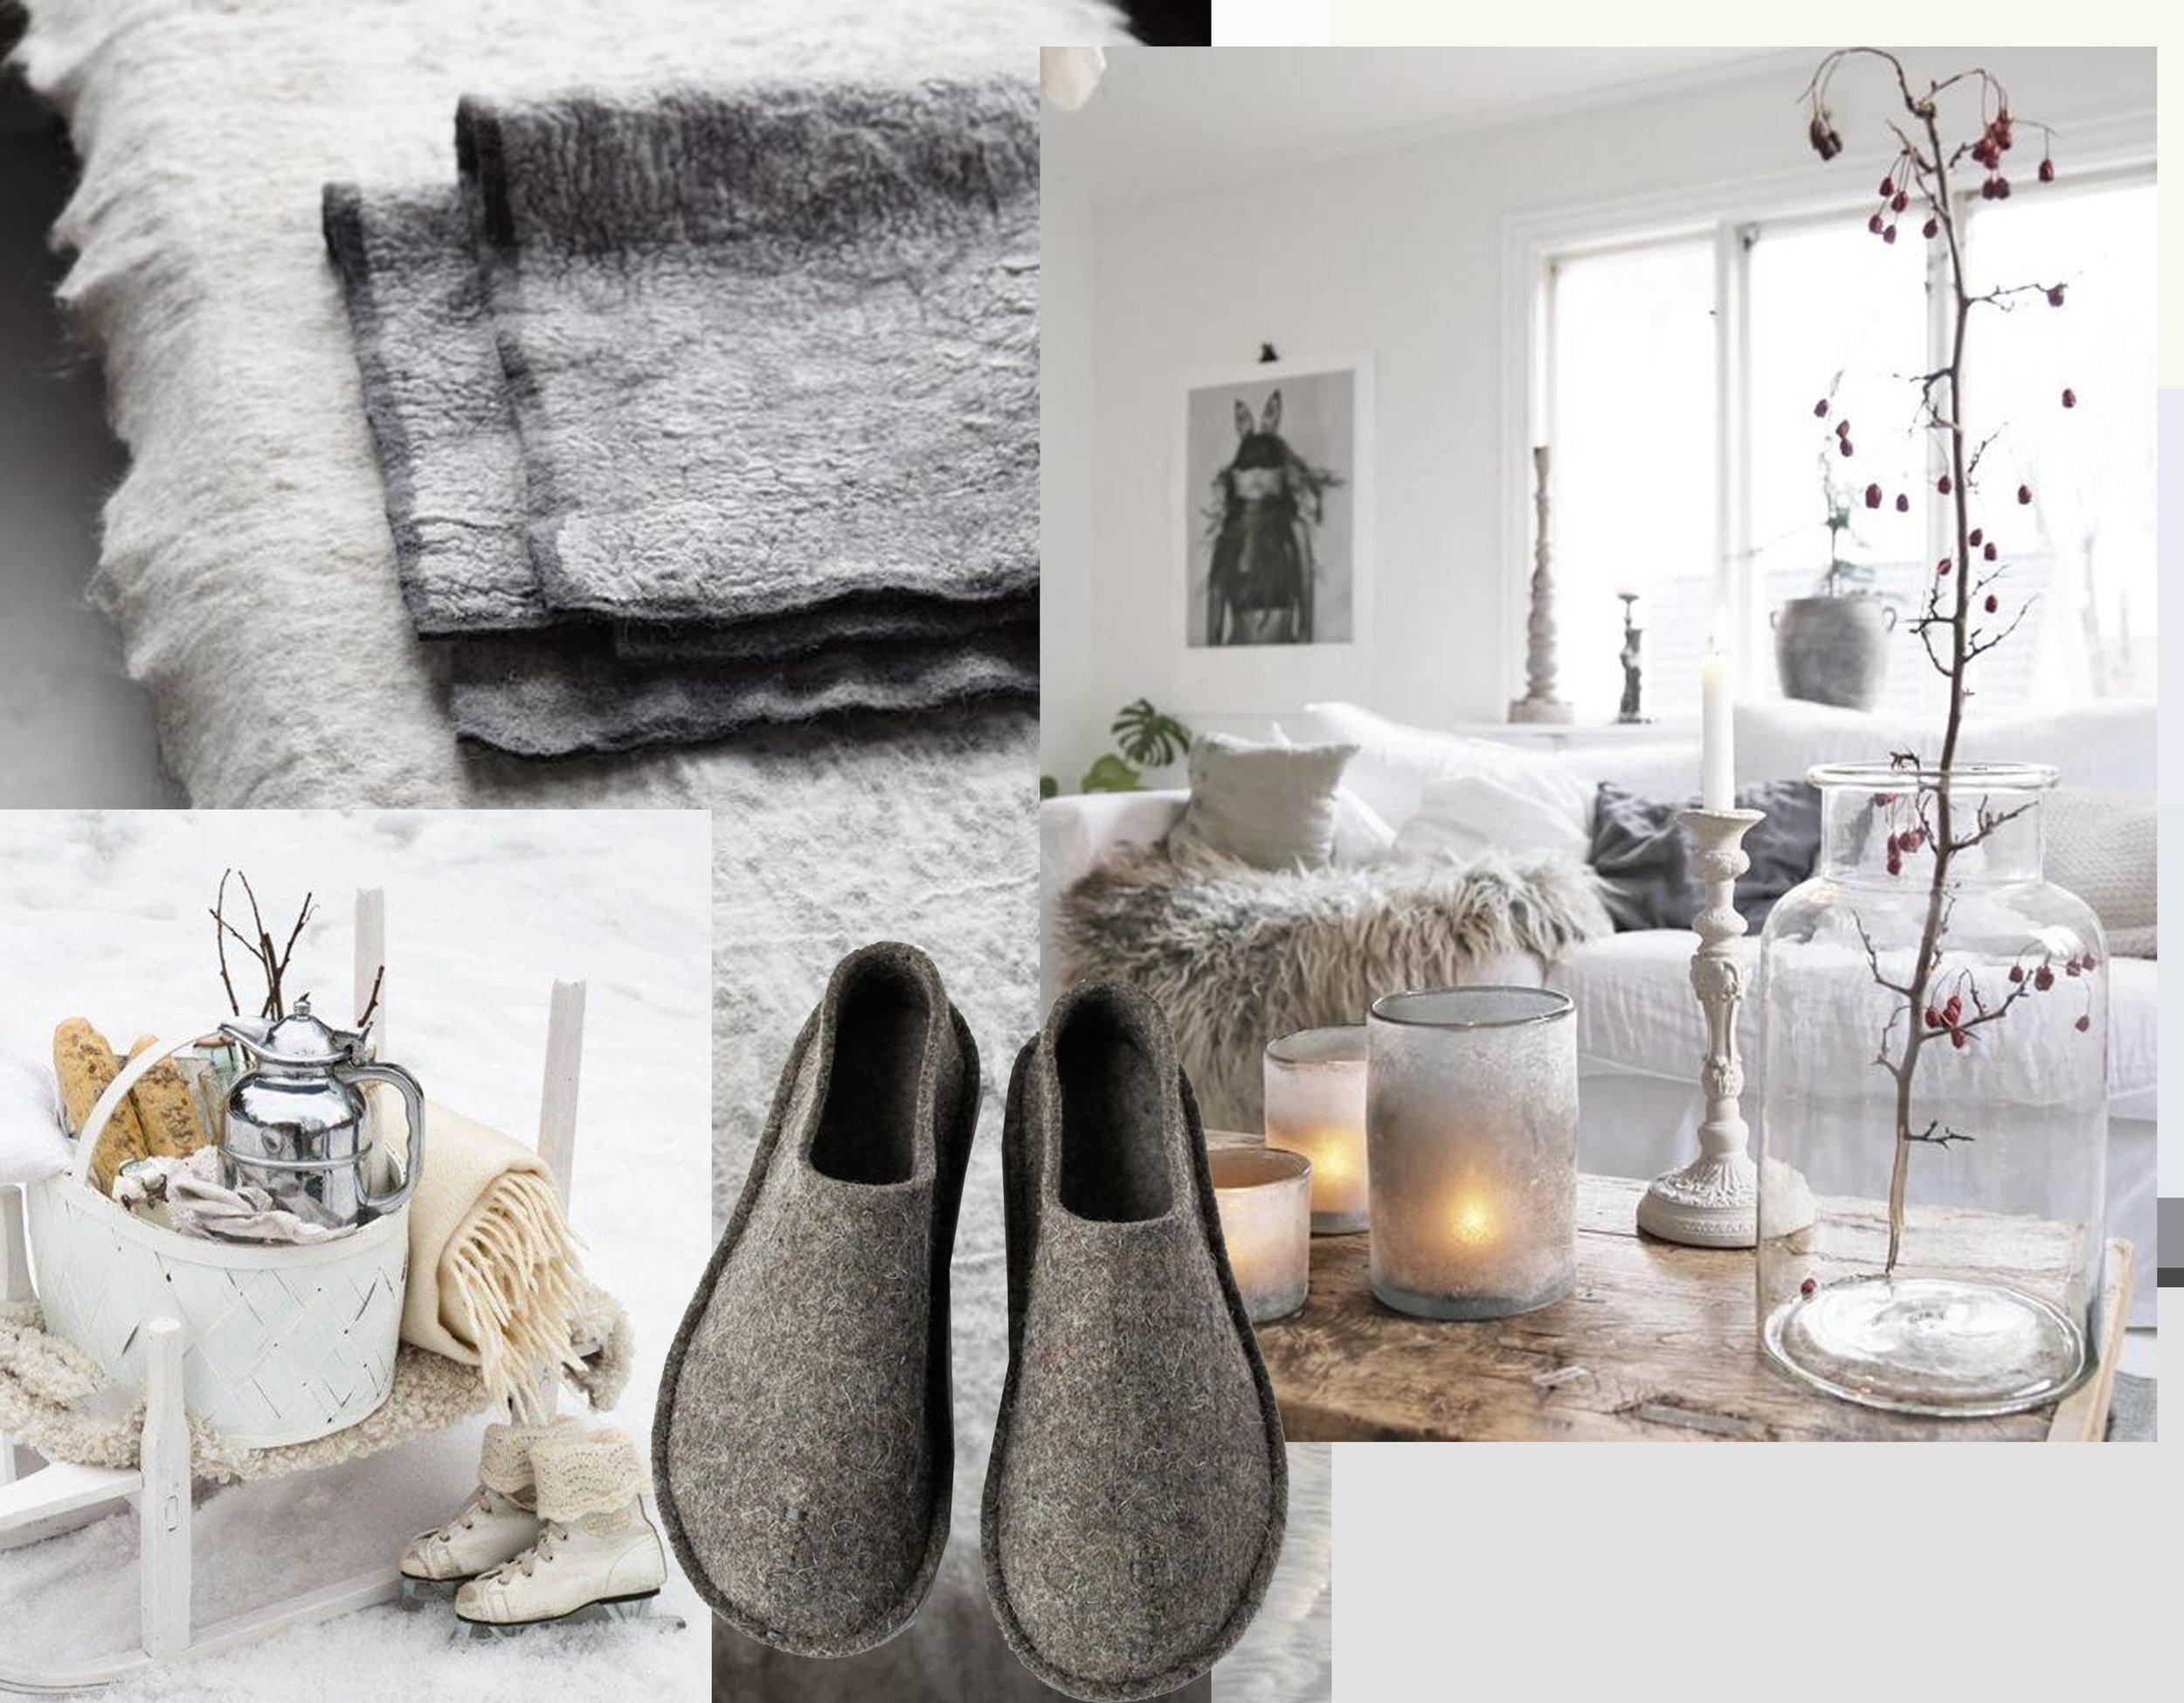 outdoor image via Pinterest - felt blankets via  VT Wonen  - felt shoes via Pinterest - interior via Instagram